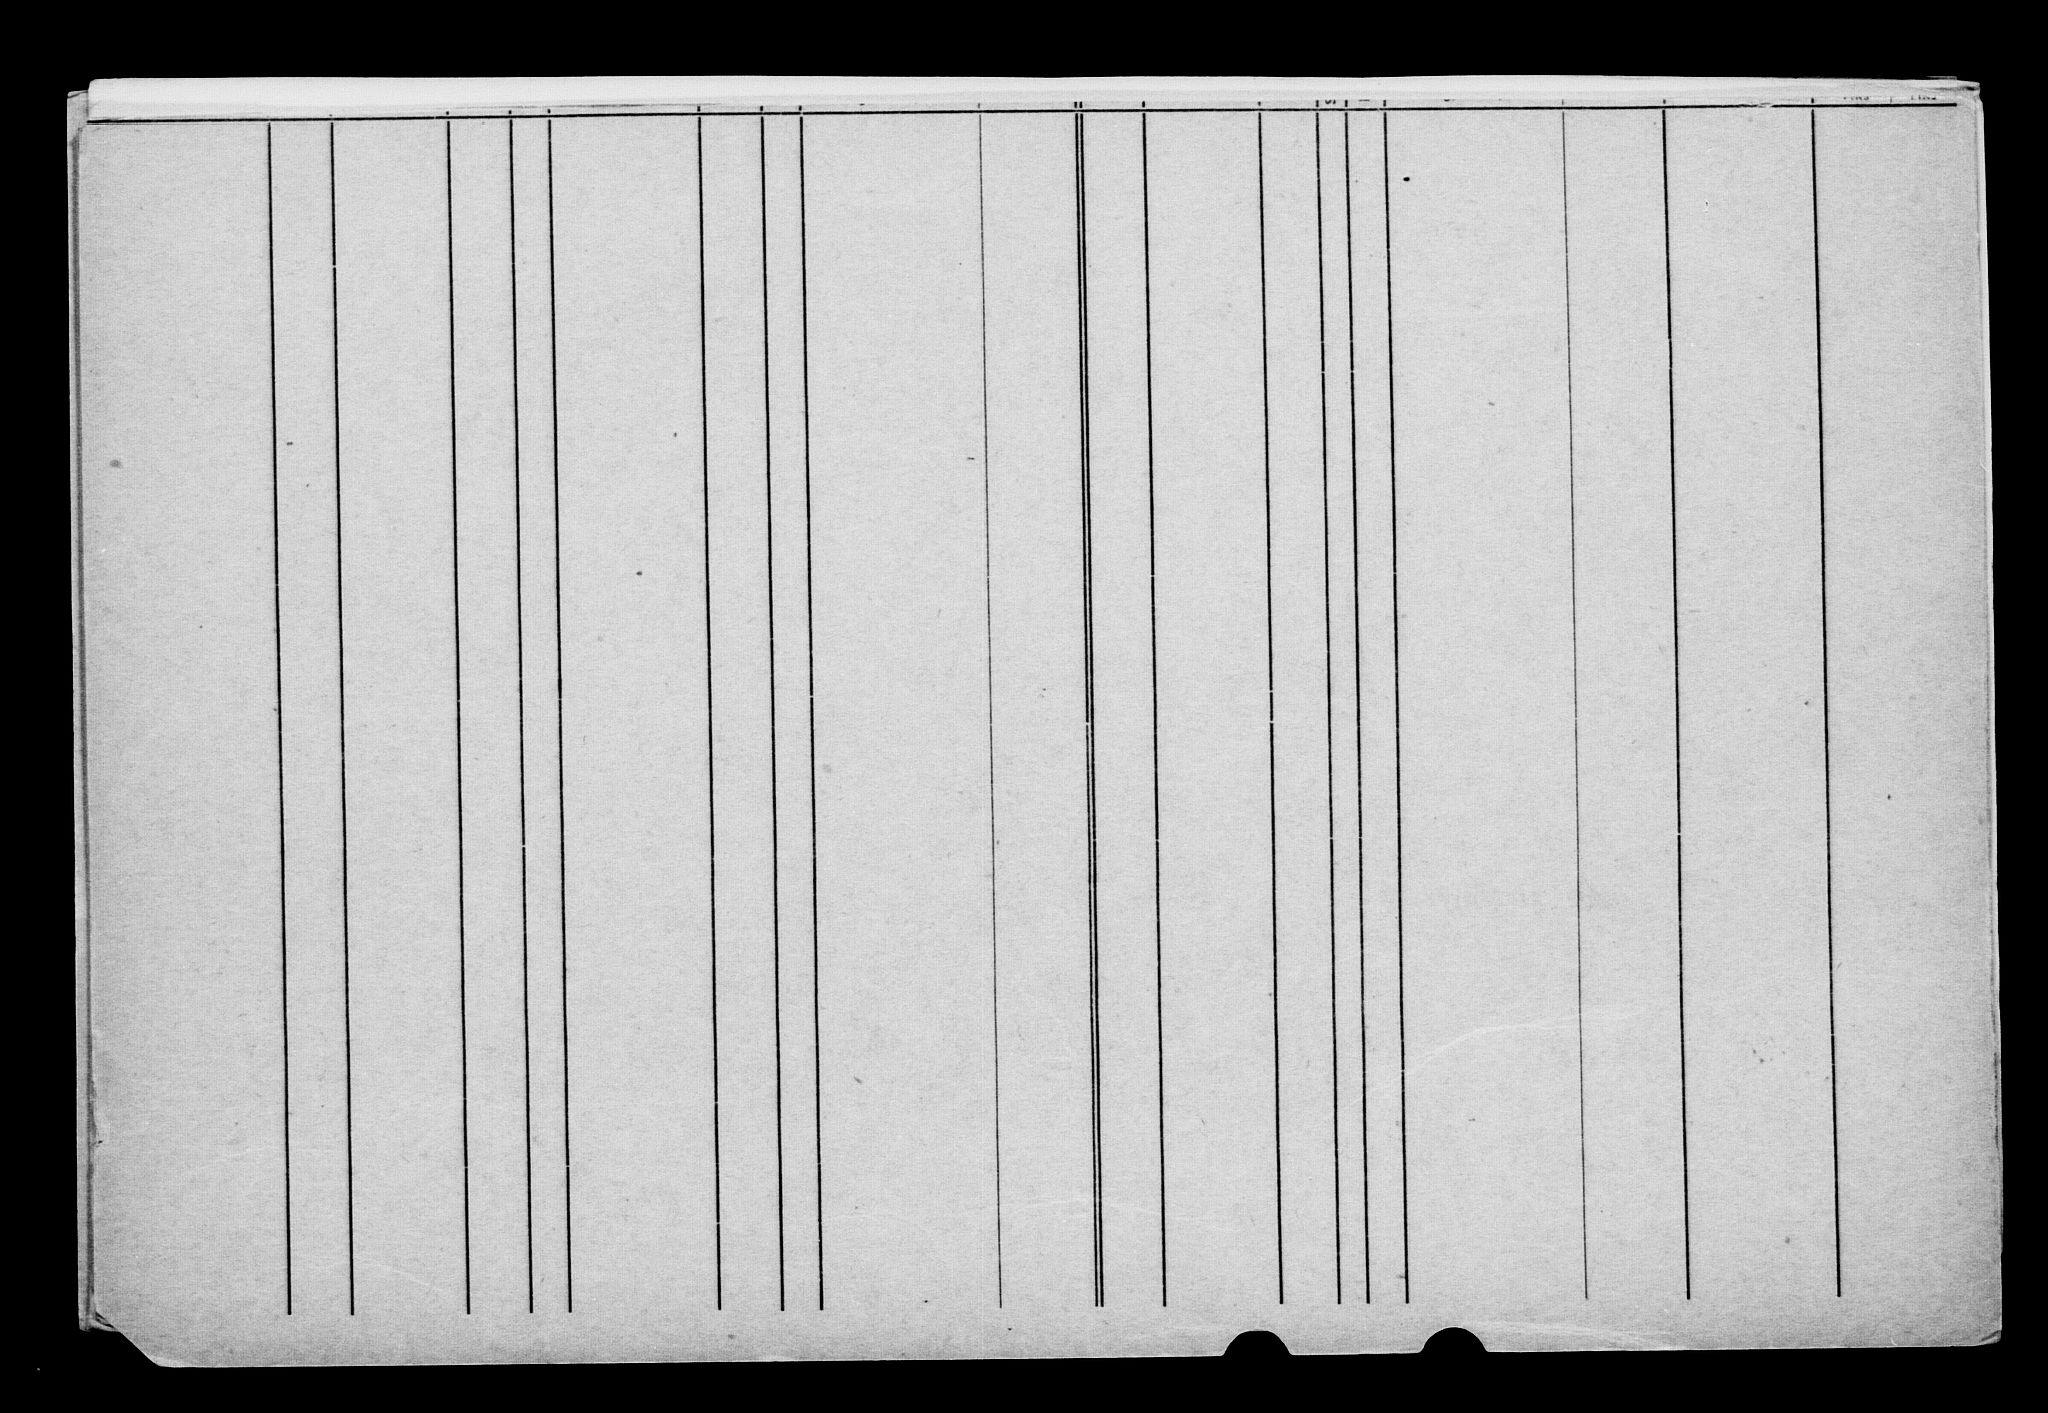 RA, Direktoratet for sjømenn, G/Gb/L0010: Hovedkort, 1891-1892, s. 321